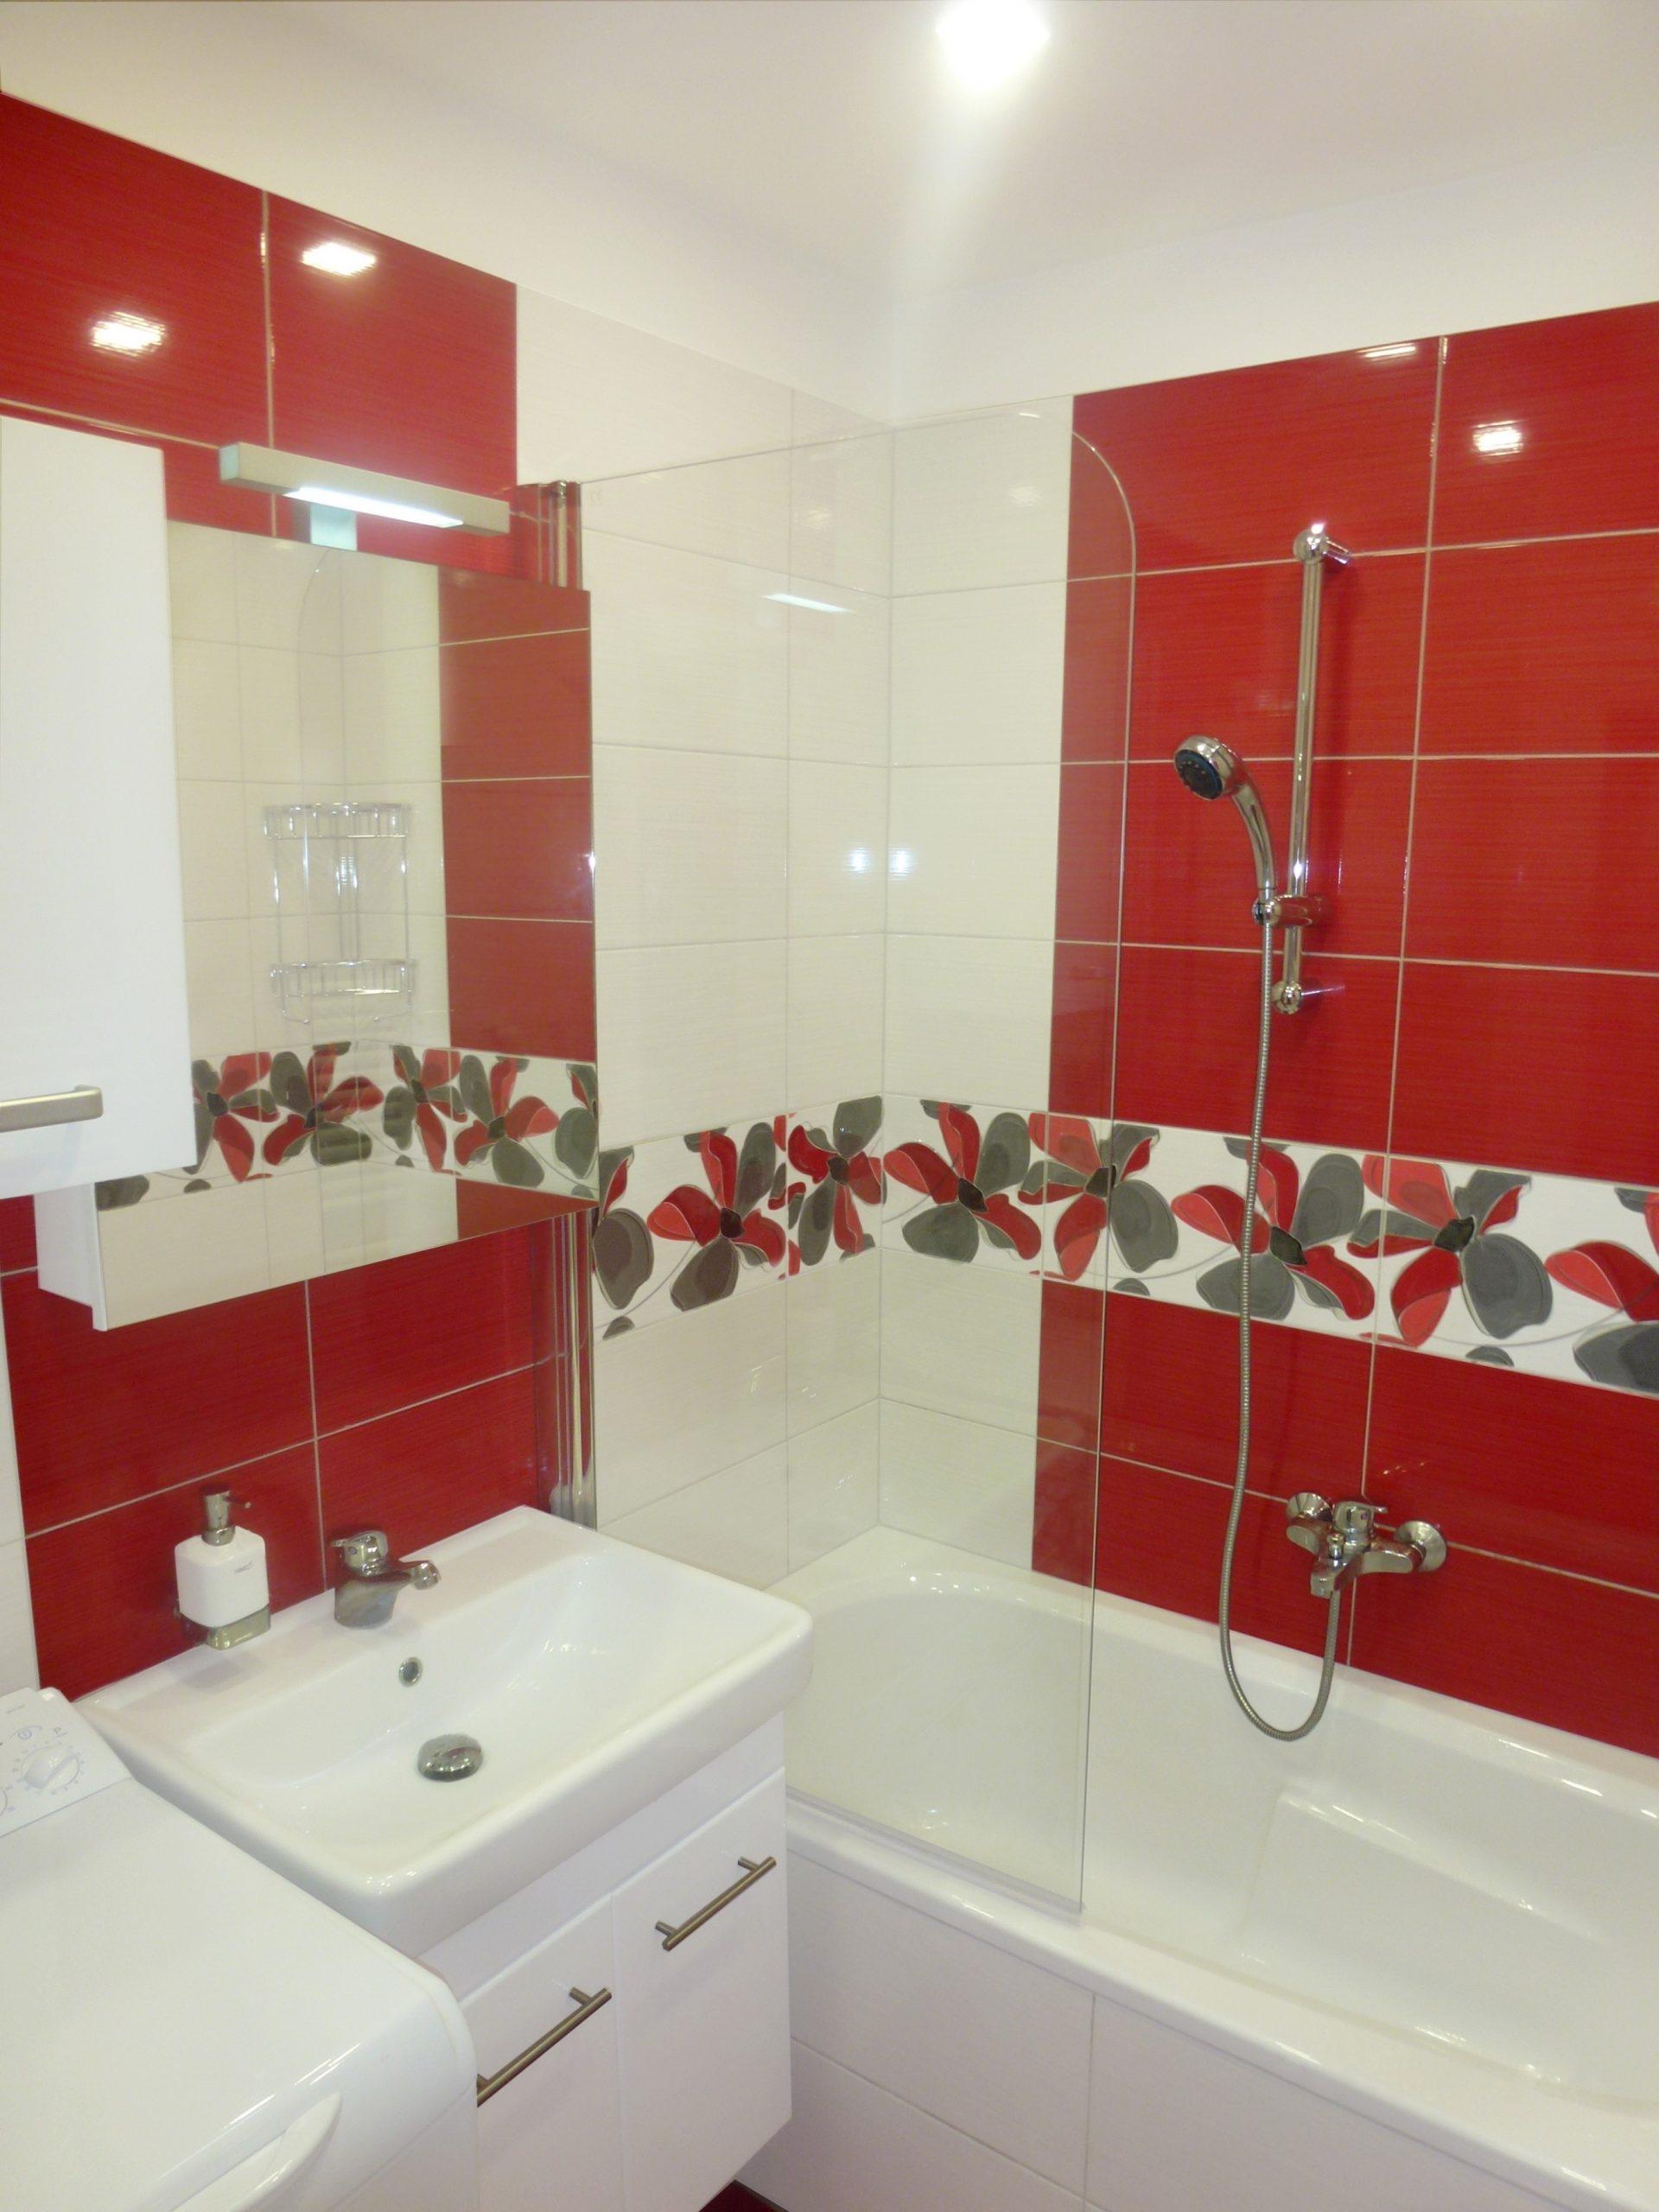 Rekonstrukce malé koupelny Svitavy   PEM trade s.r.o.